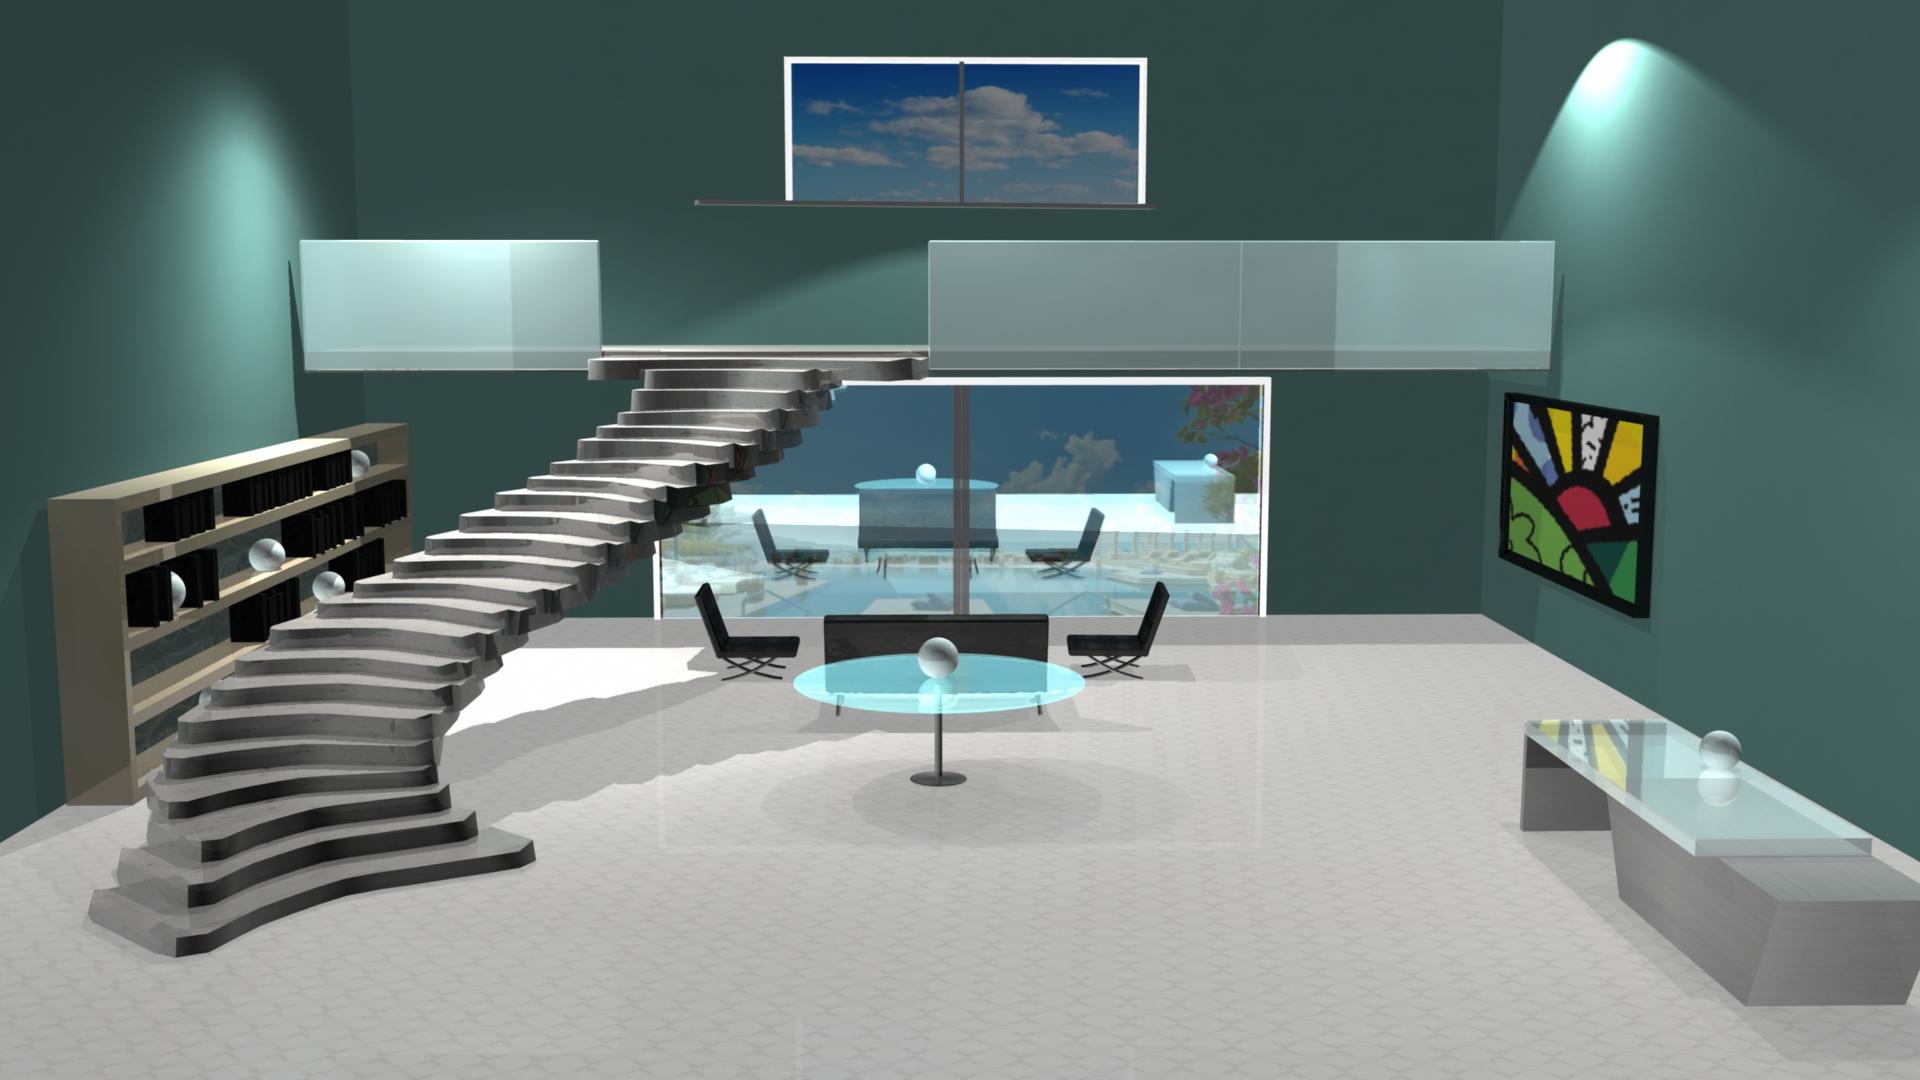 Hotel Lobby Design 1